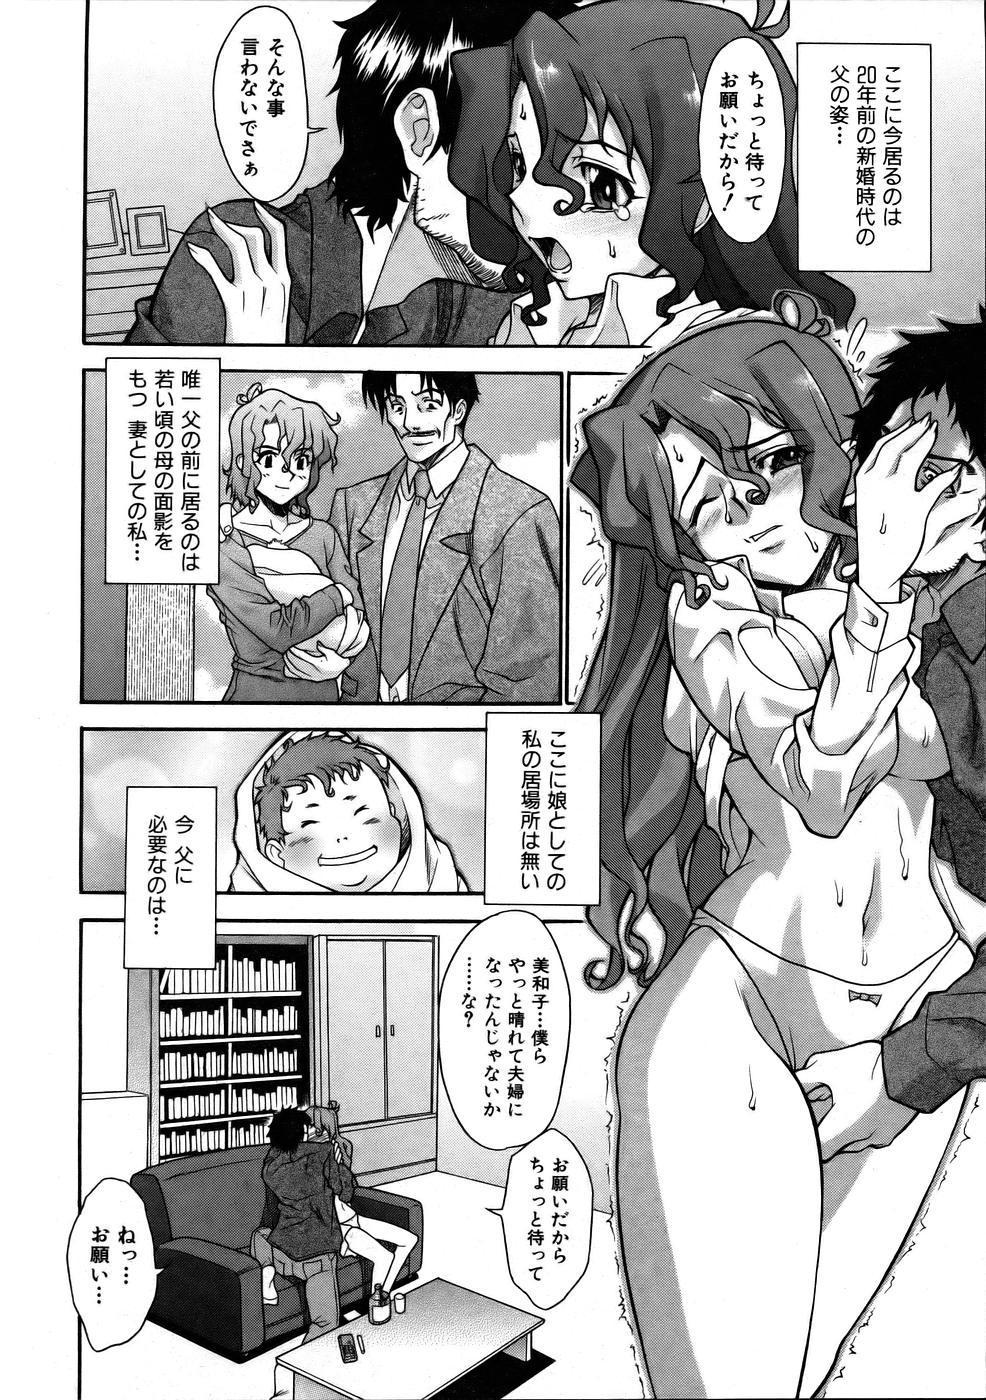 COMIC AUN 2005-10 Vol. 113 141